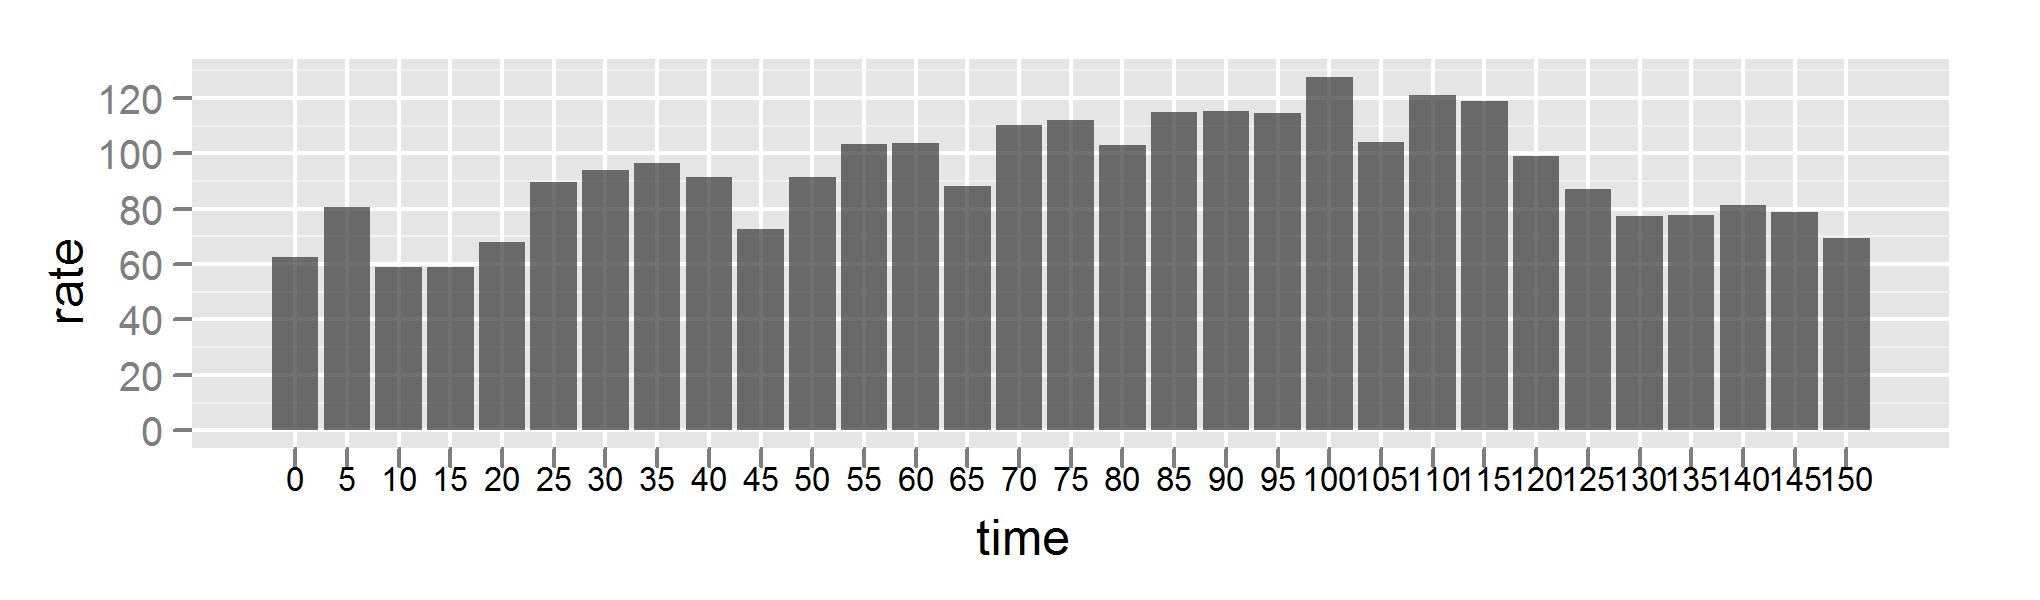 Bar chart of heart rate data